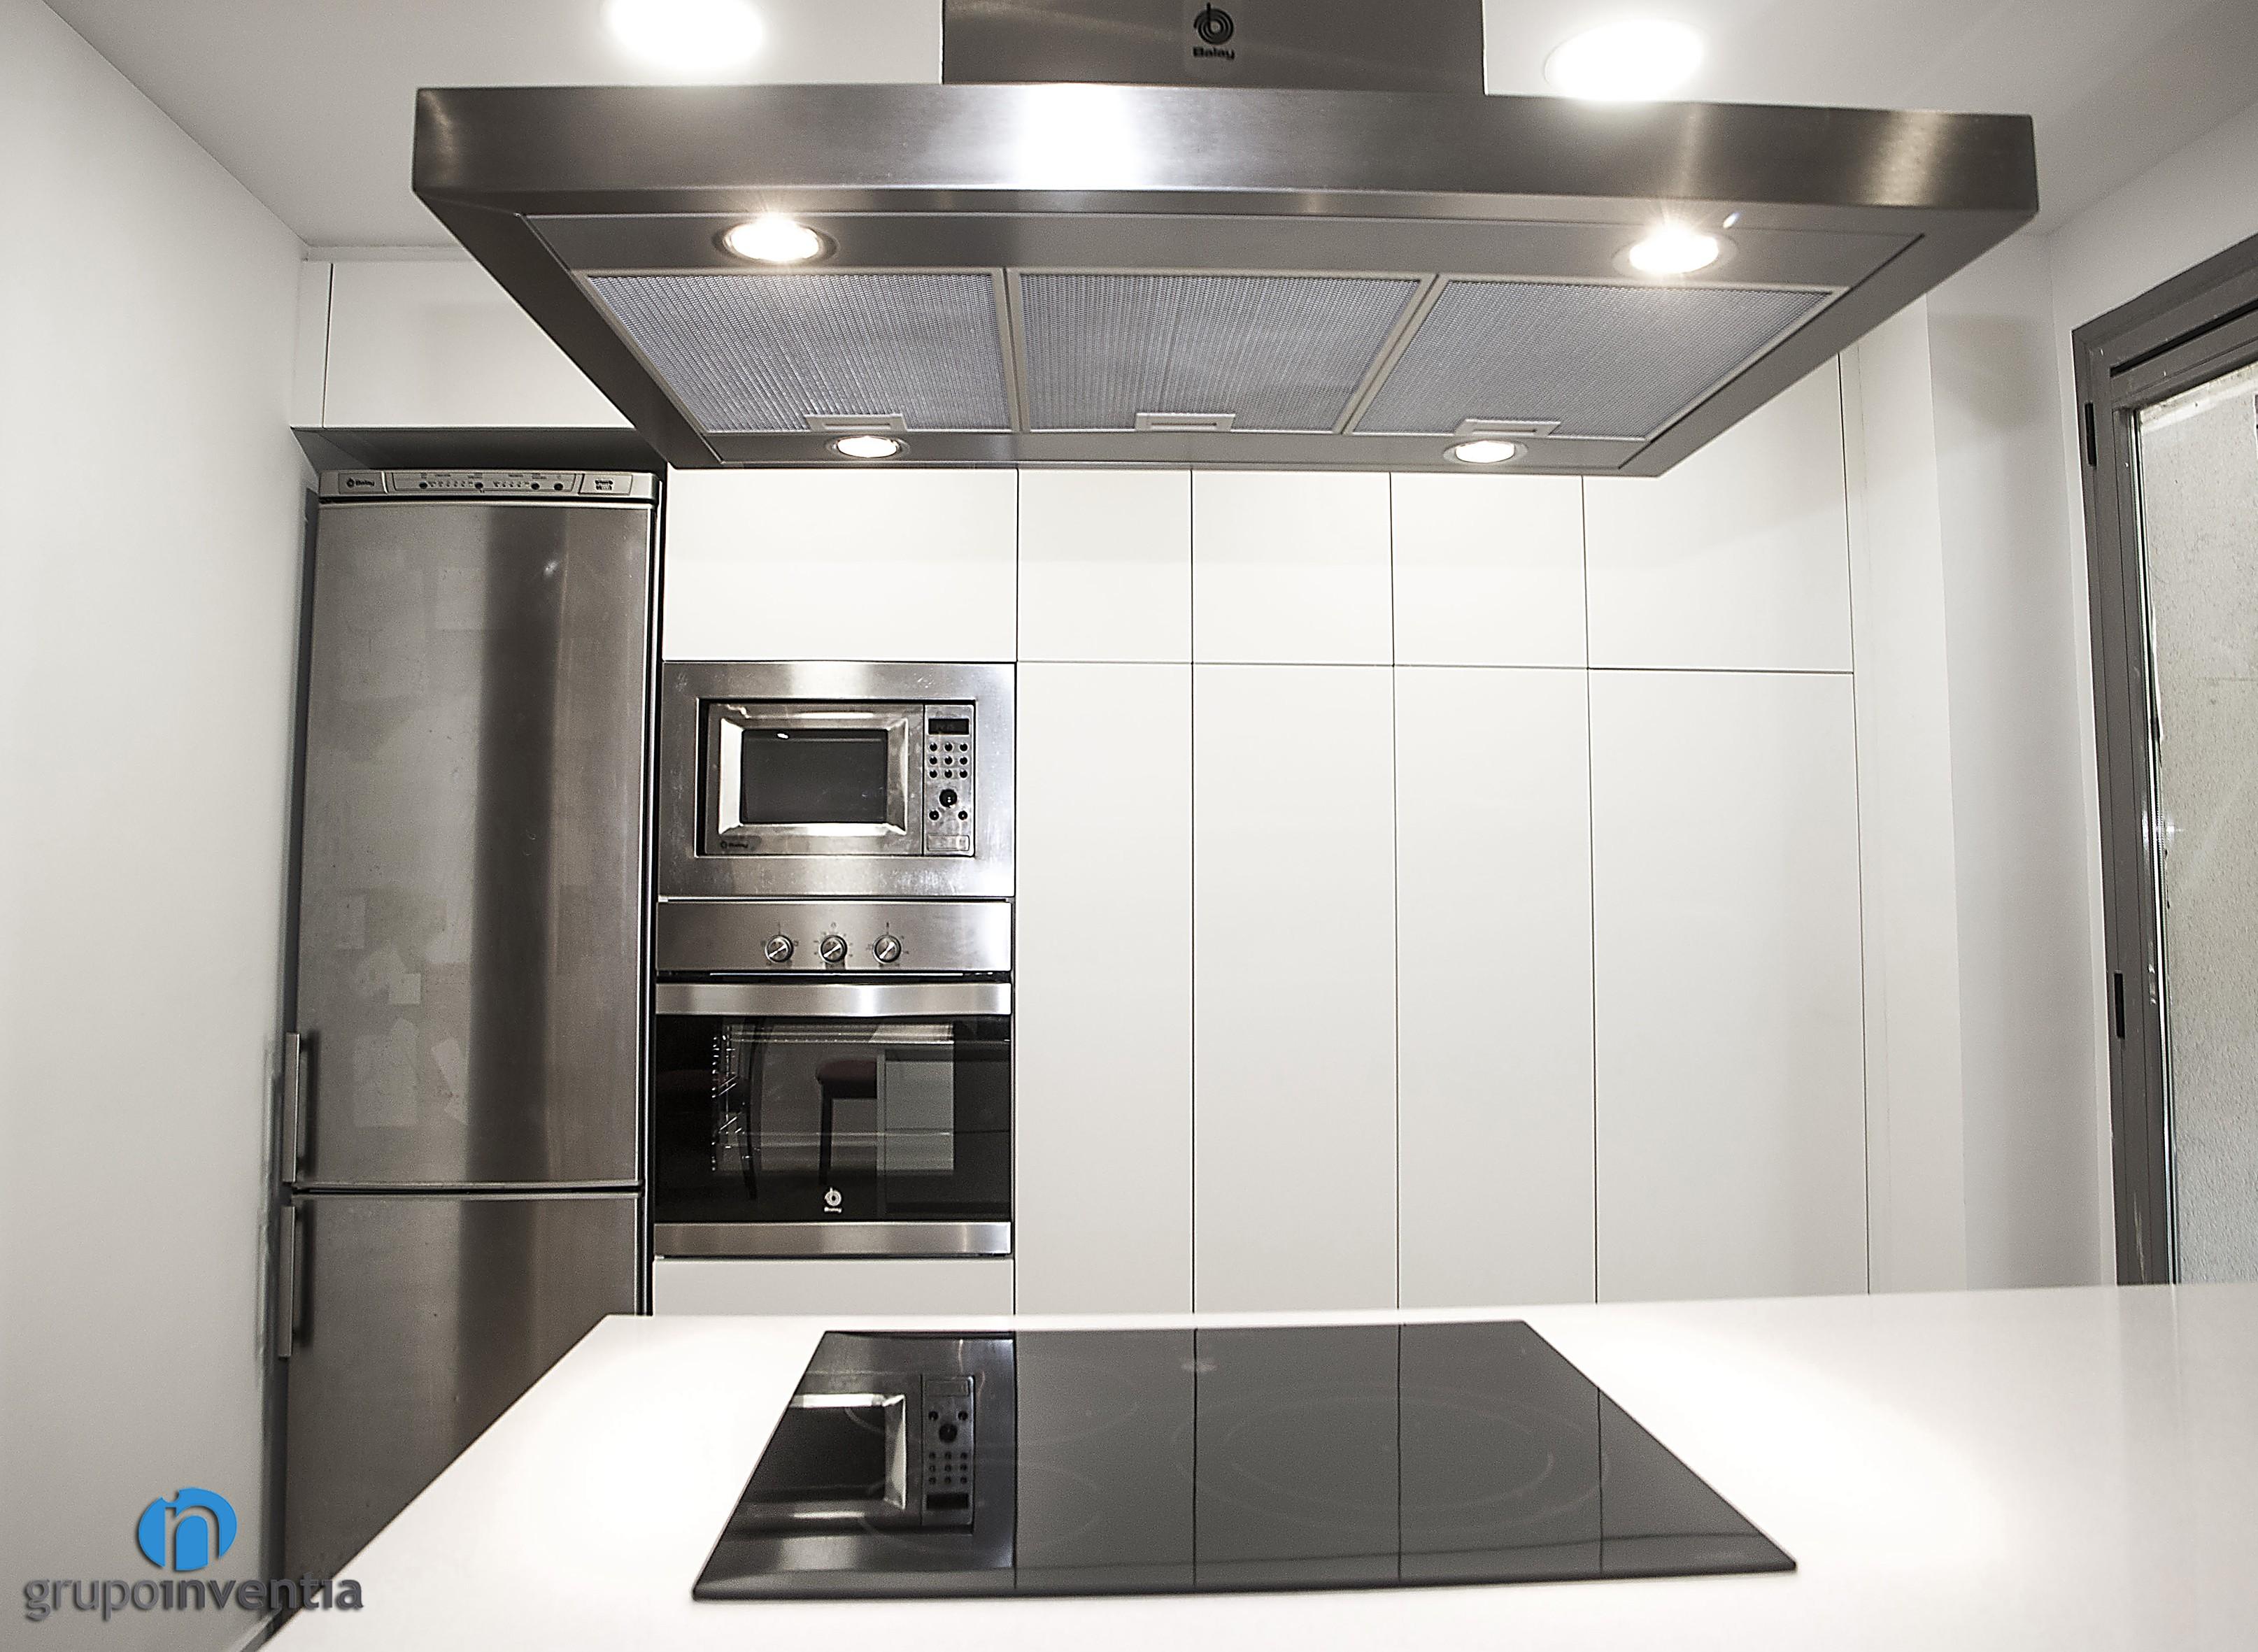 Almacenaje de cocina grupo inventia - Almacenaje de cocina ...